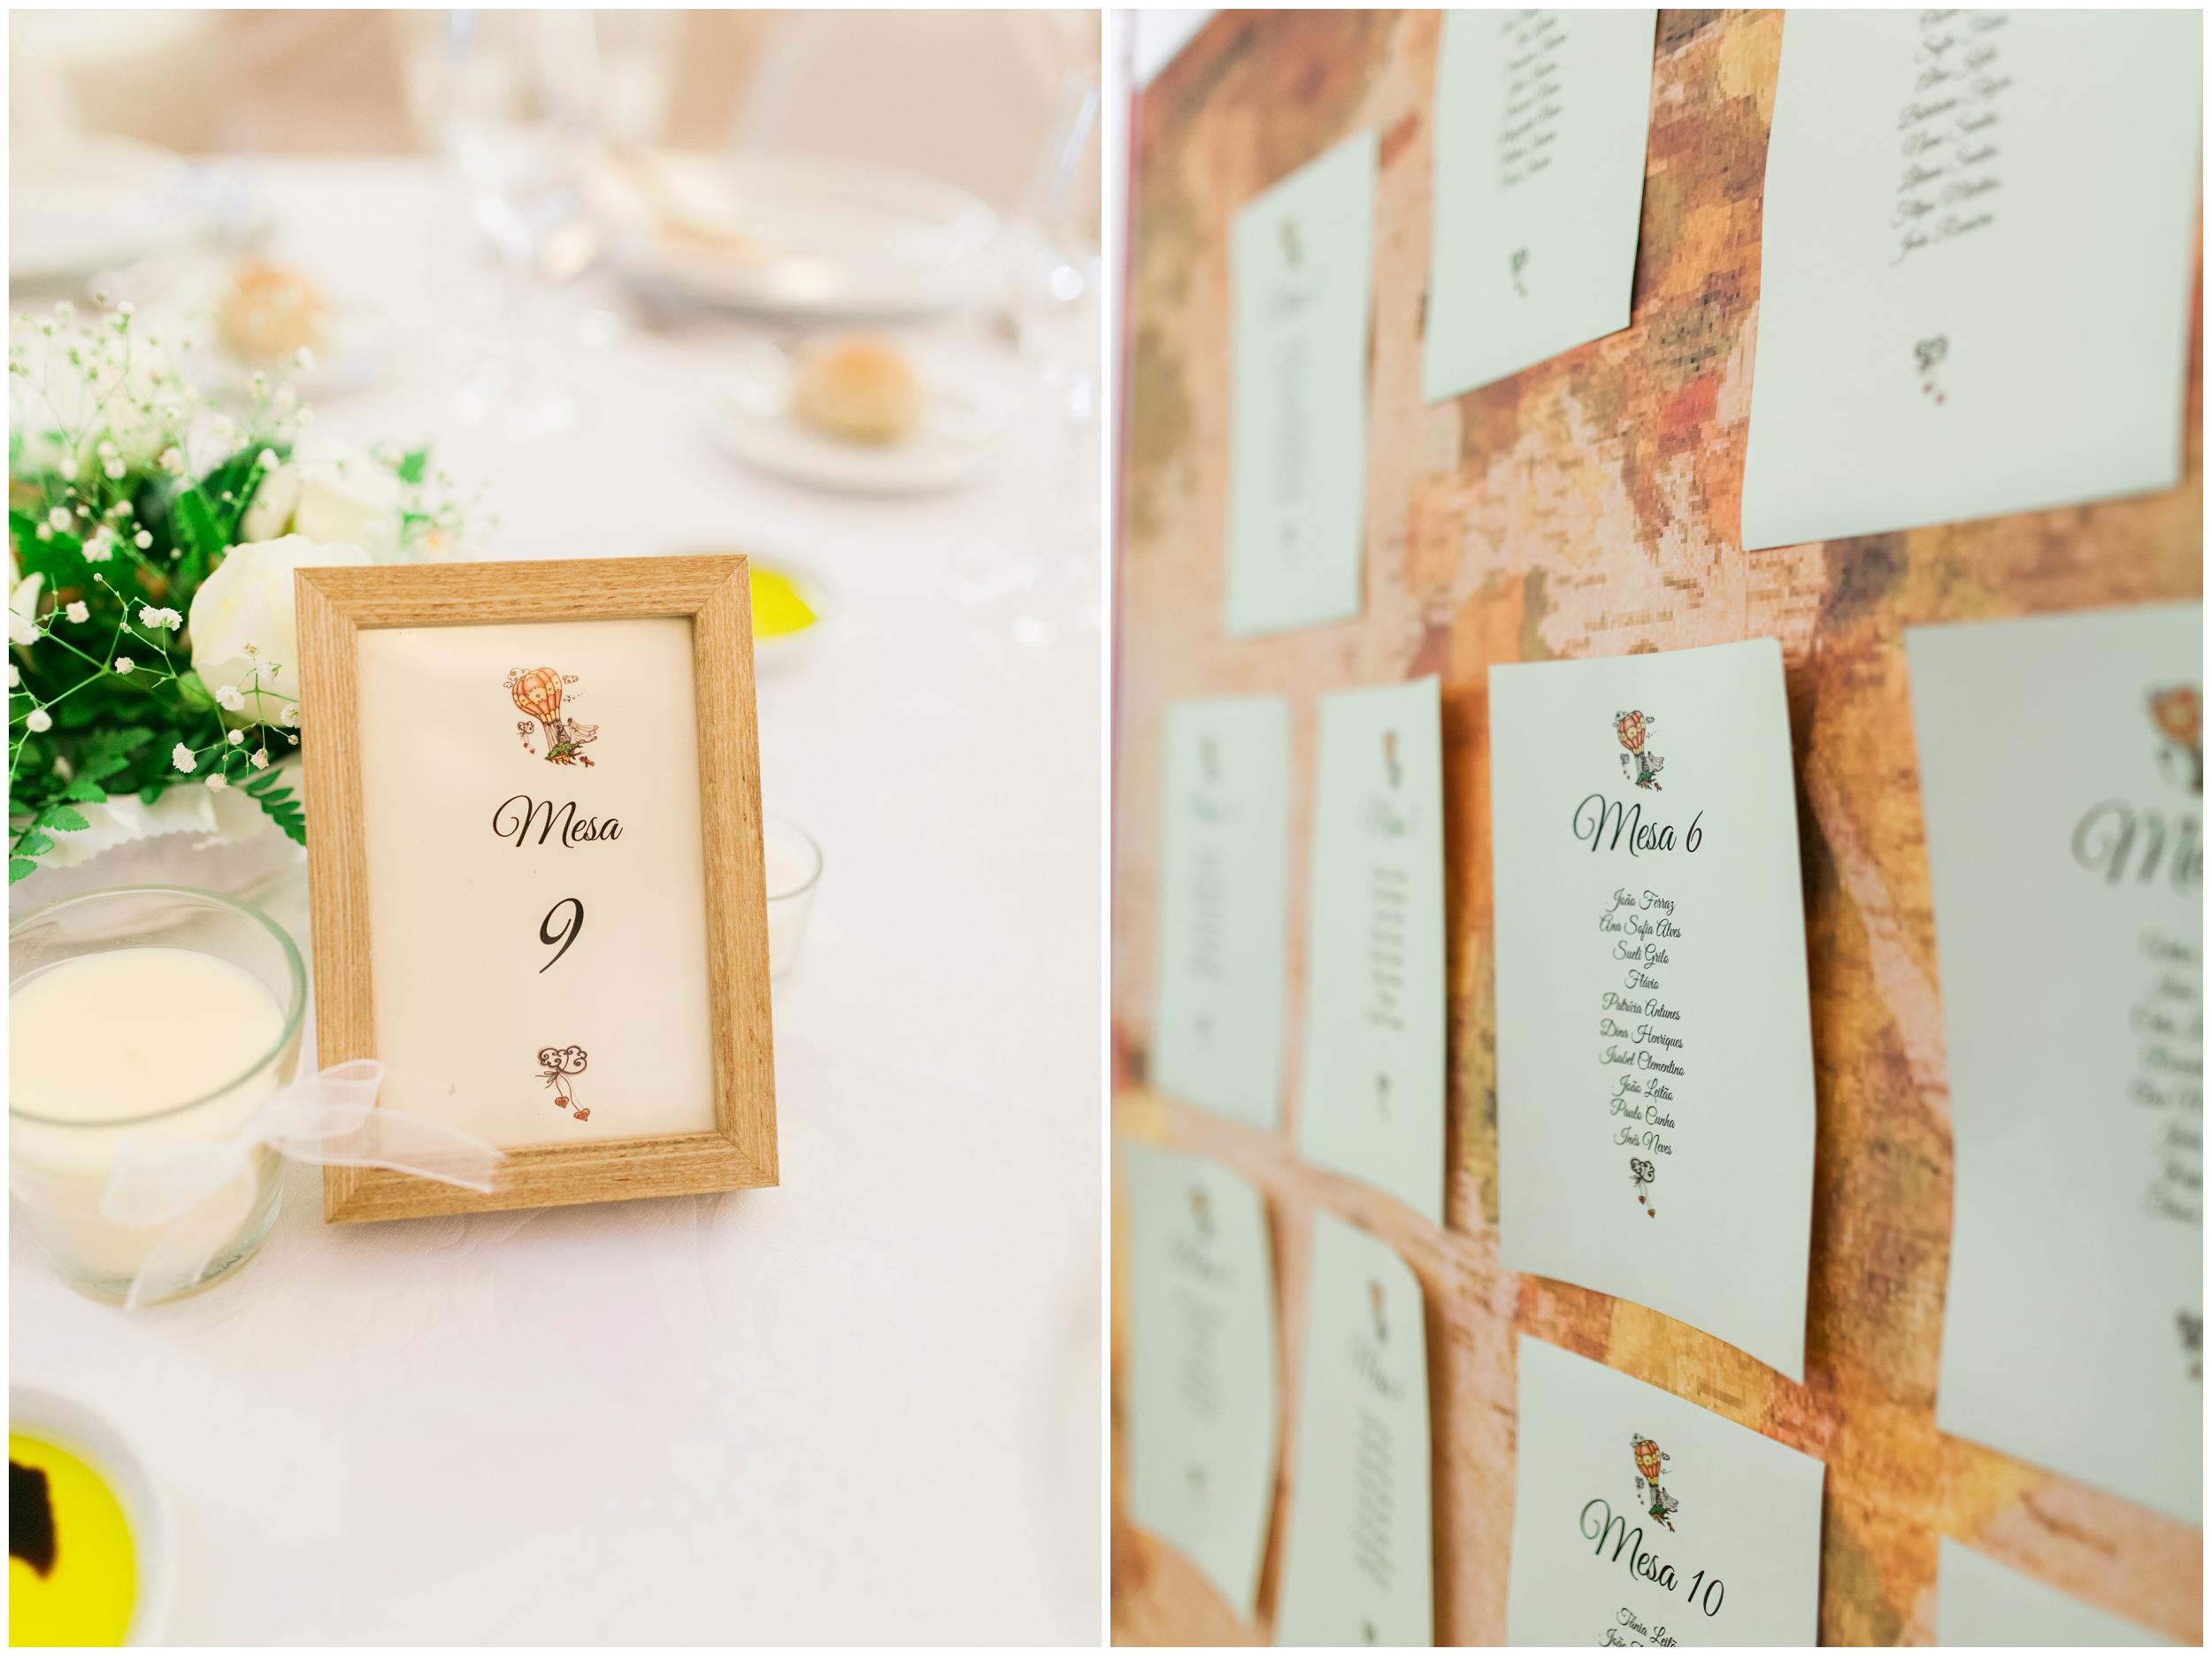 maria+rao+photography+wedding+palacio+lousa_0008.jpg